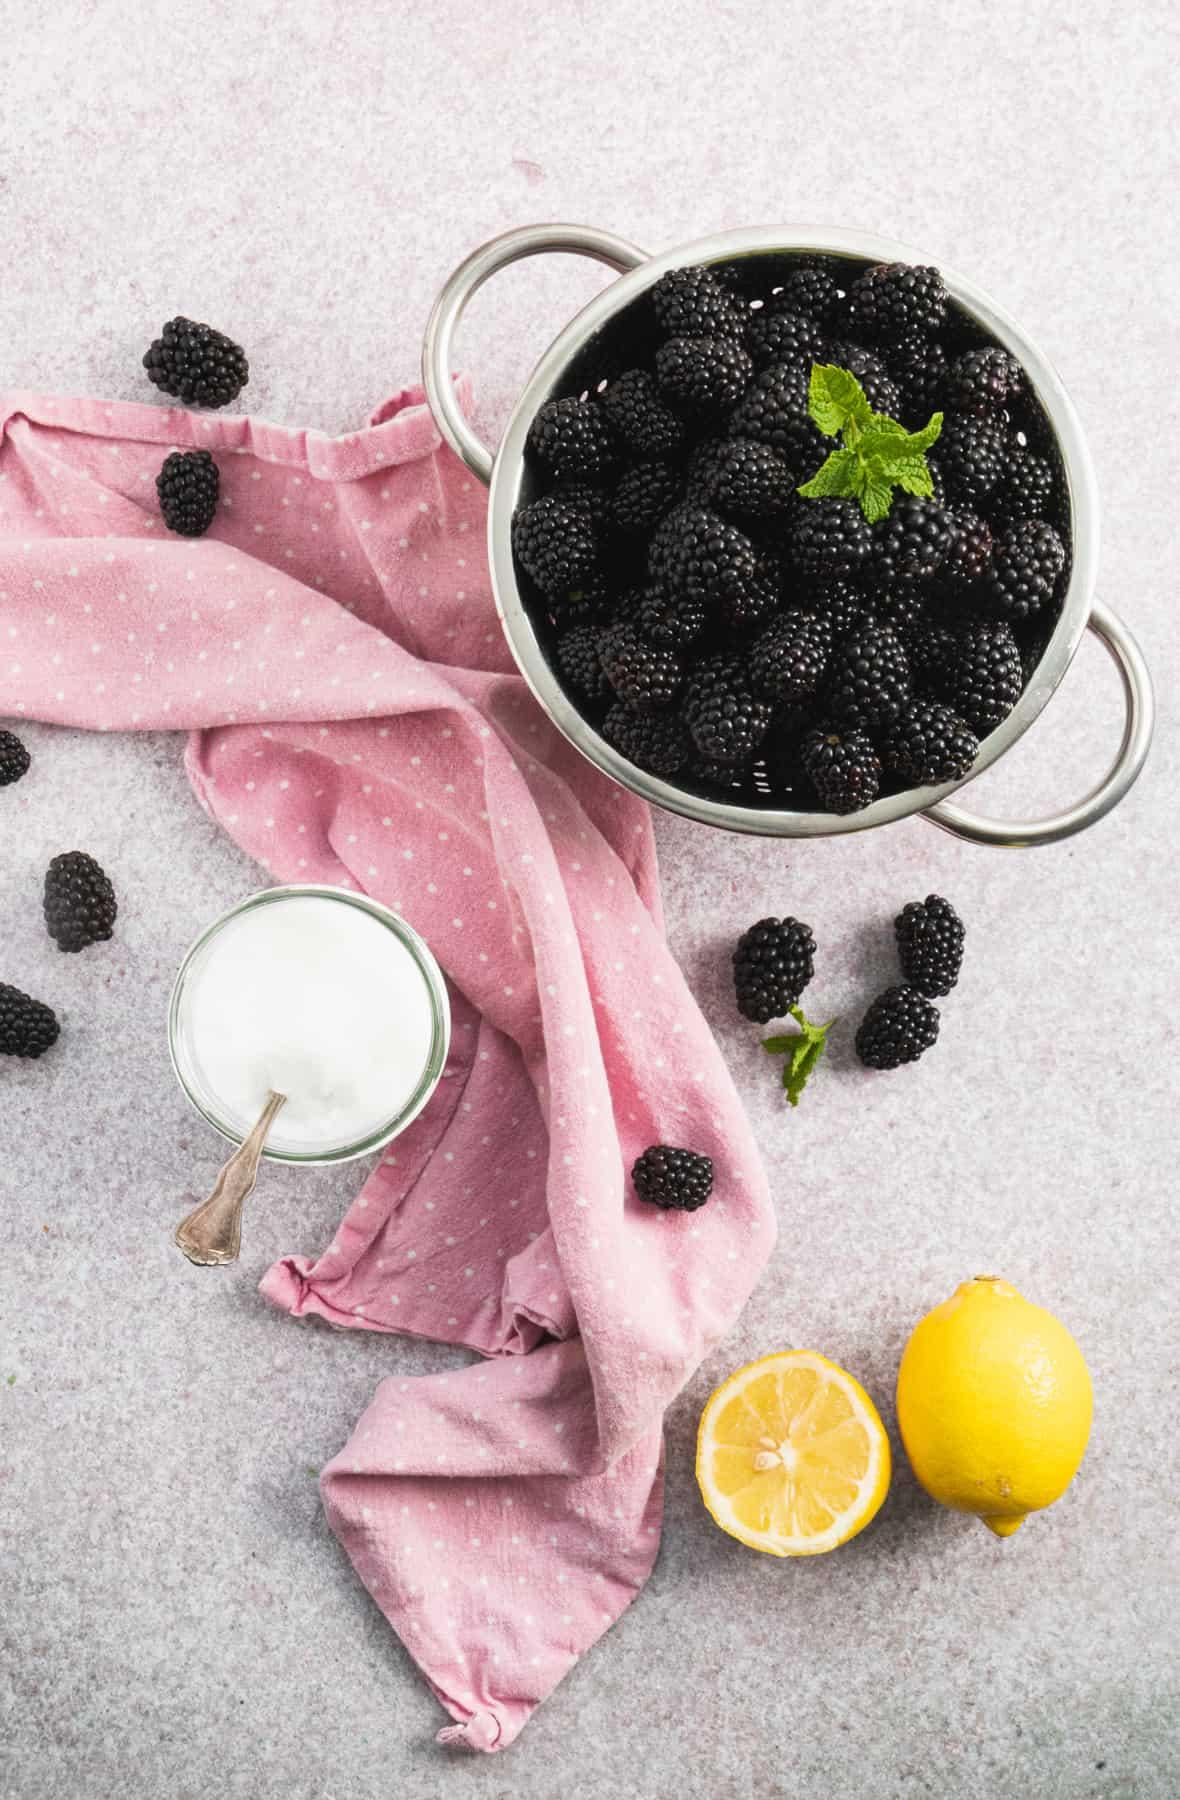 Top view of the ingredients to make jam, fresh blackberries in a colander, sugar and lemon.